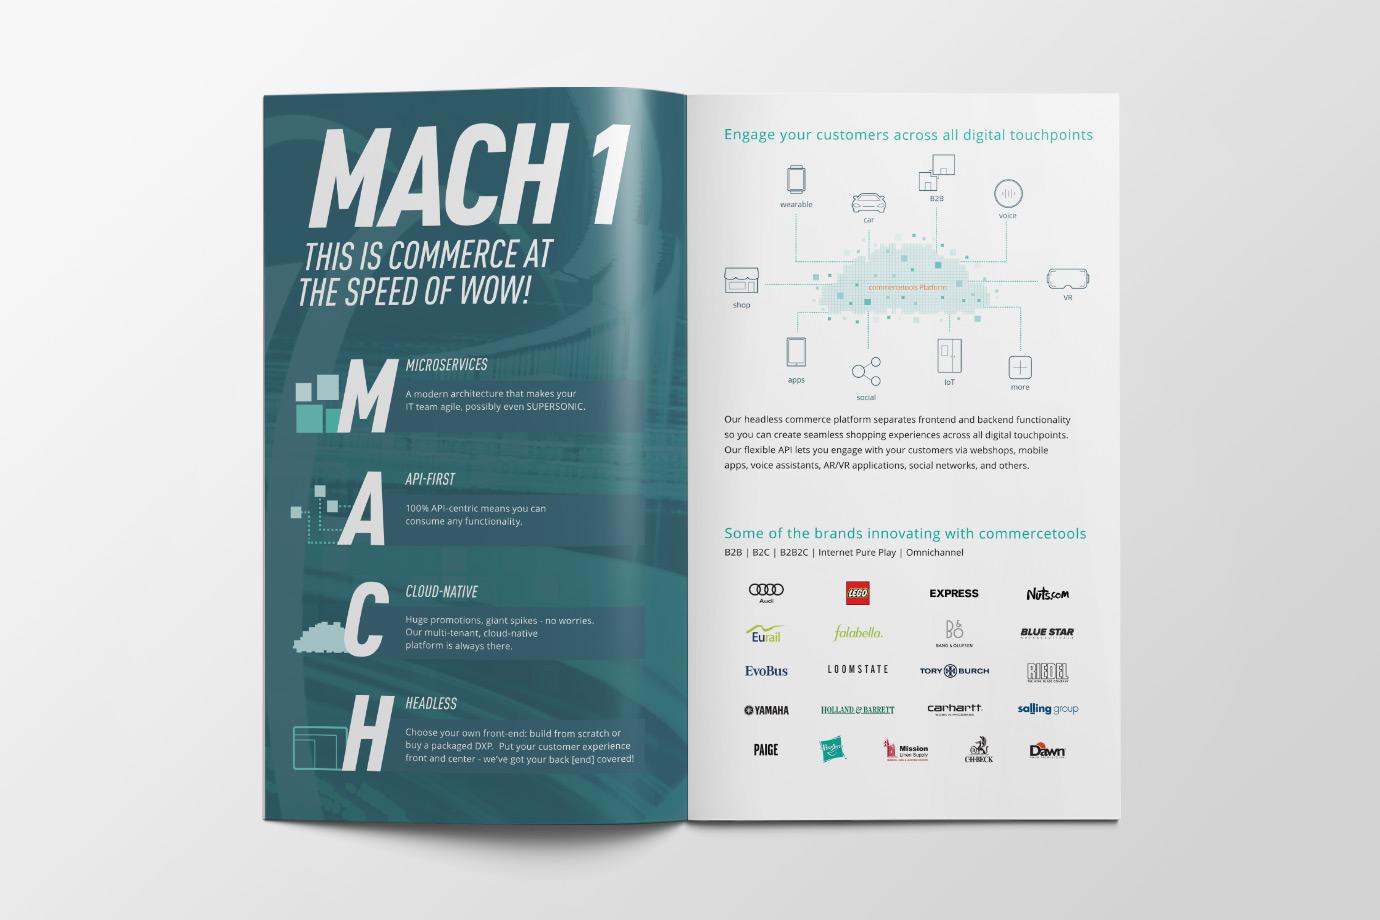 BON_COM_shoptalk_2019_mach1_brochure_spread.jpg